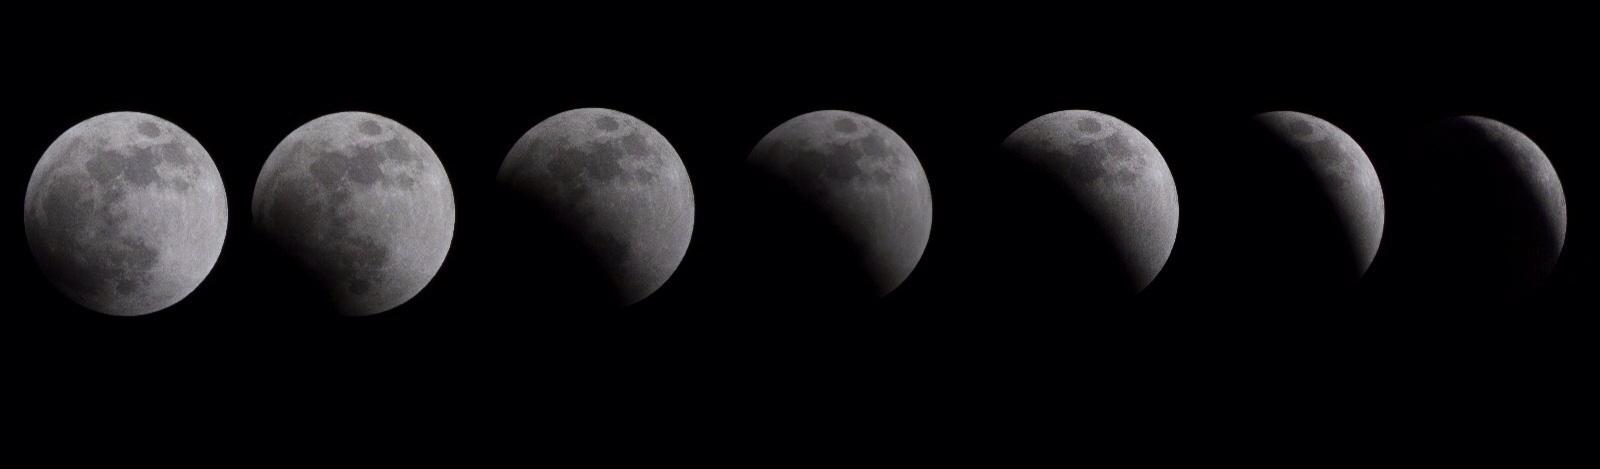 Luna 18